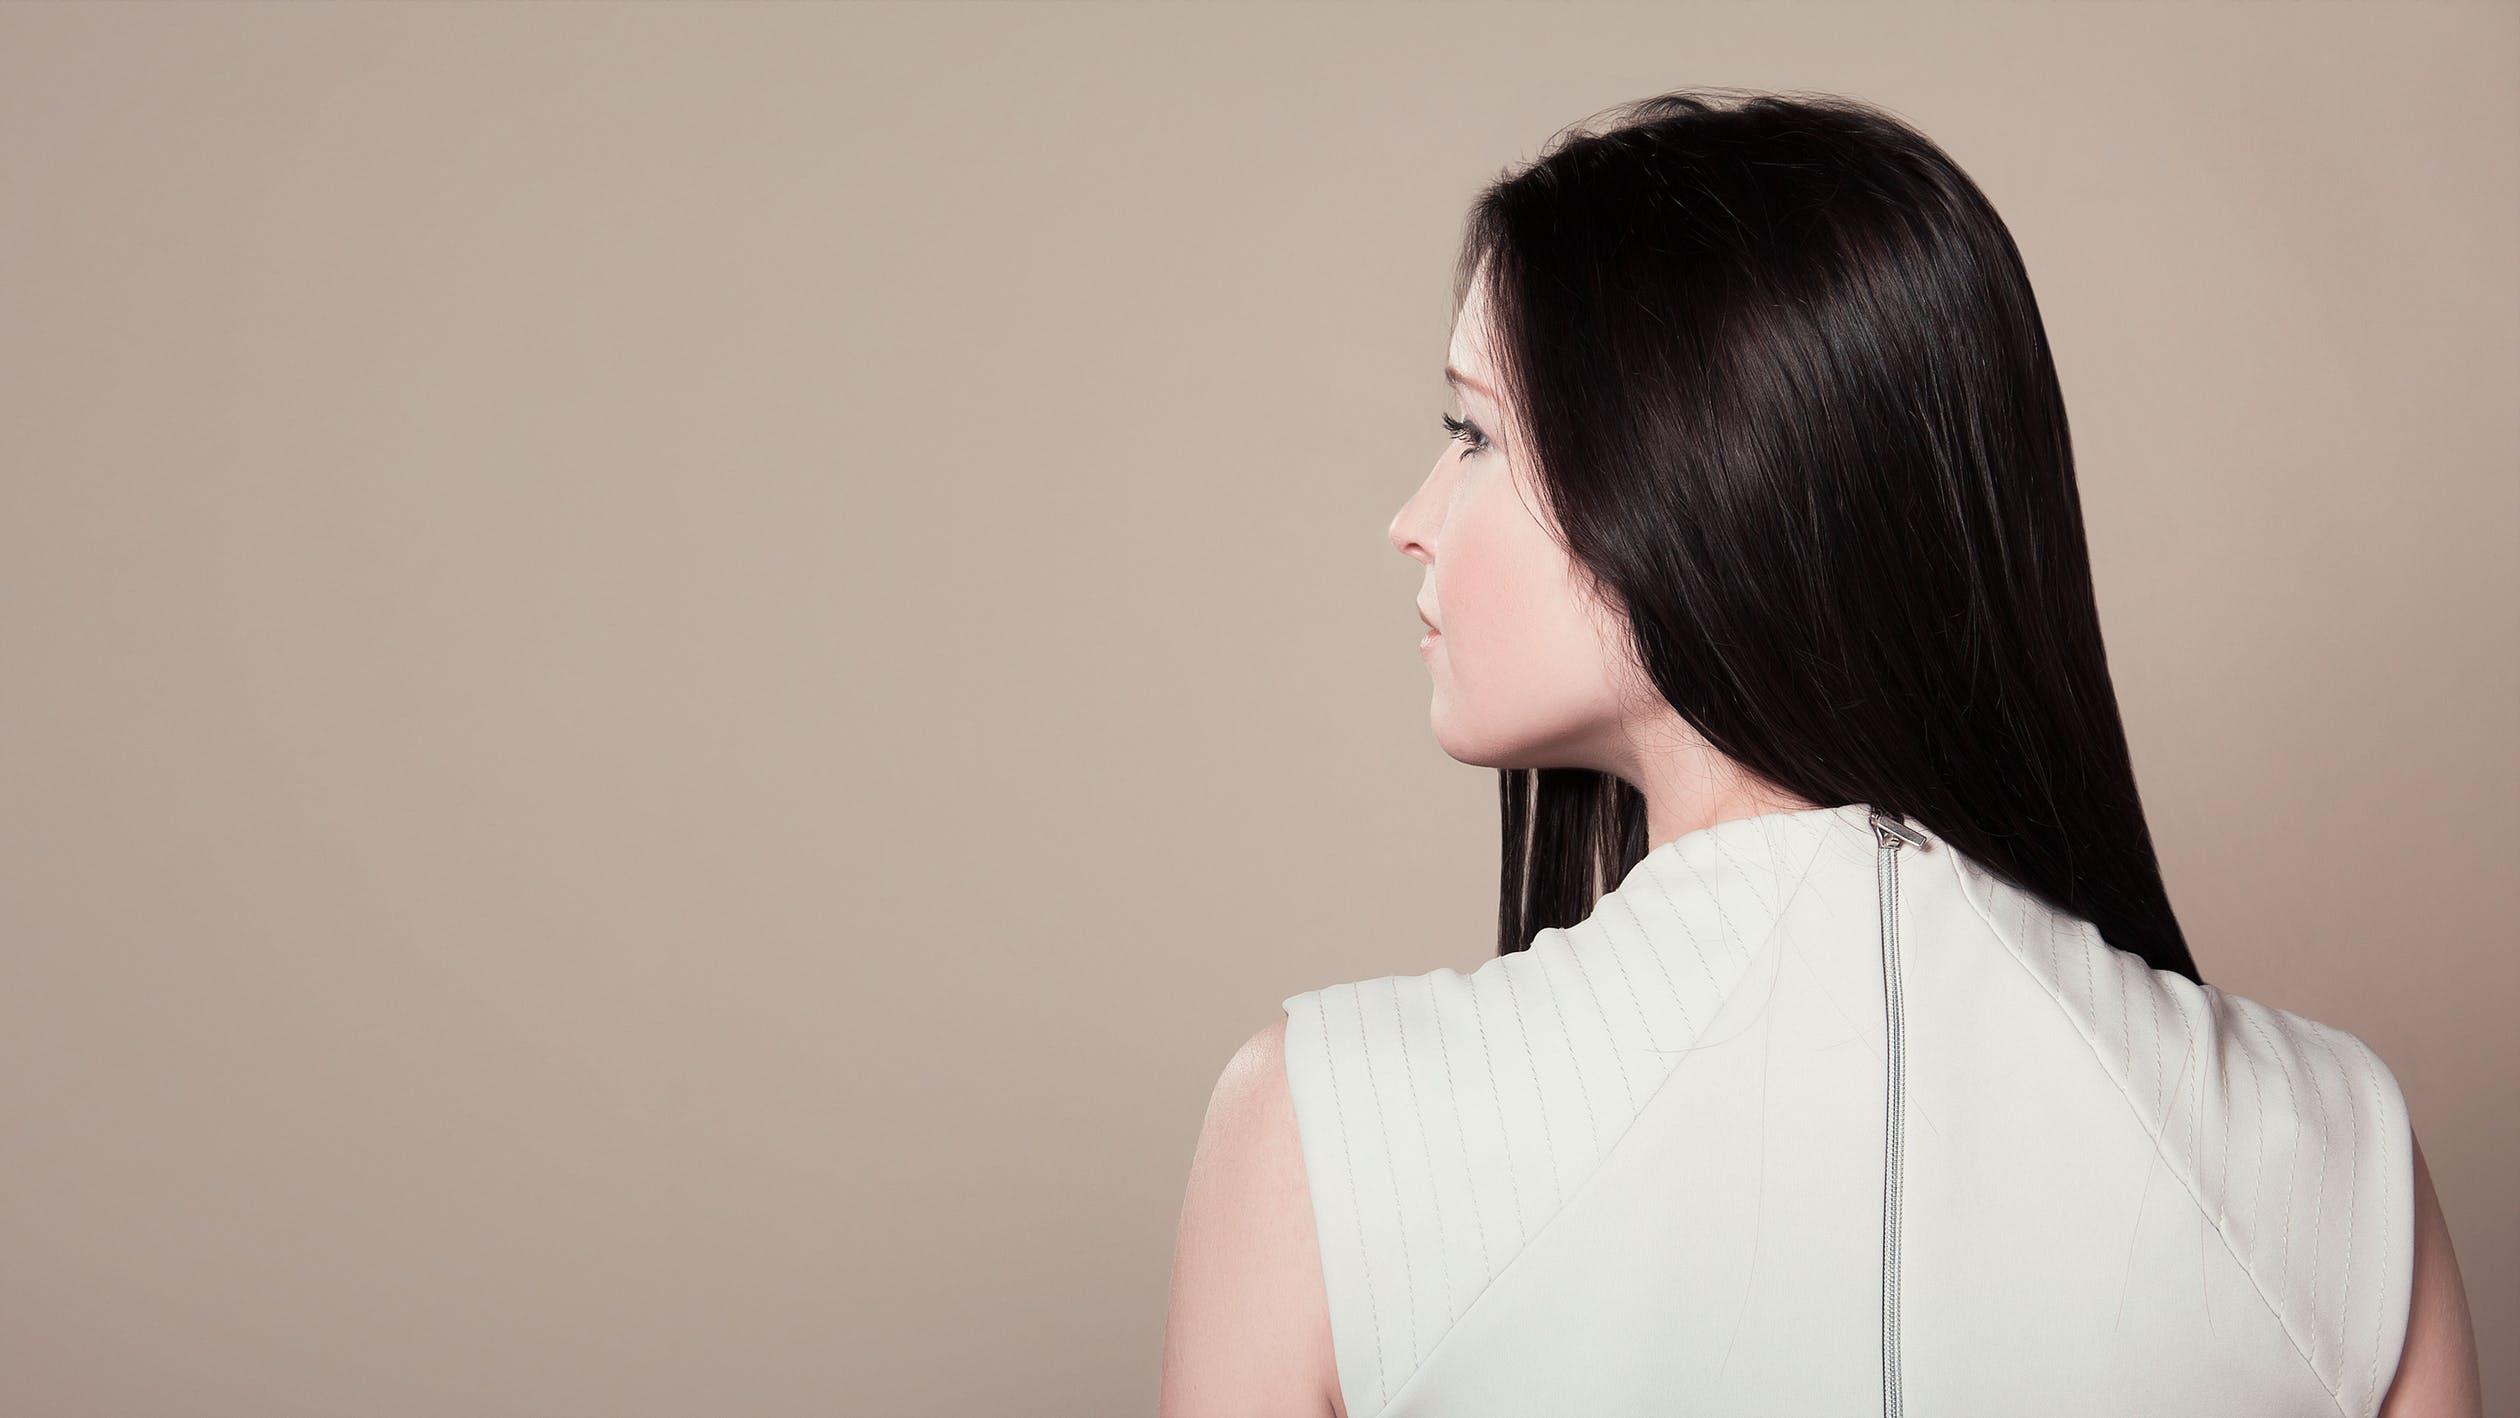 10 Habits for Longer, Healthier, More Gorgeous Hair